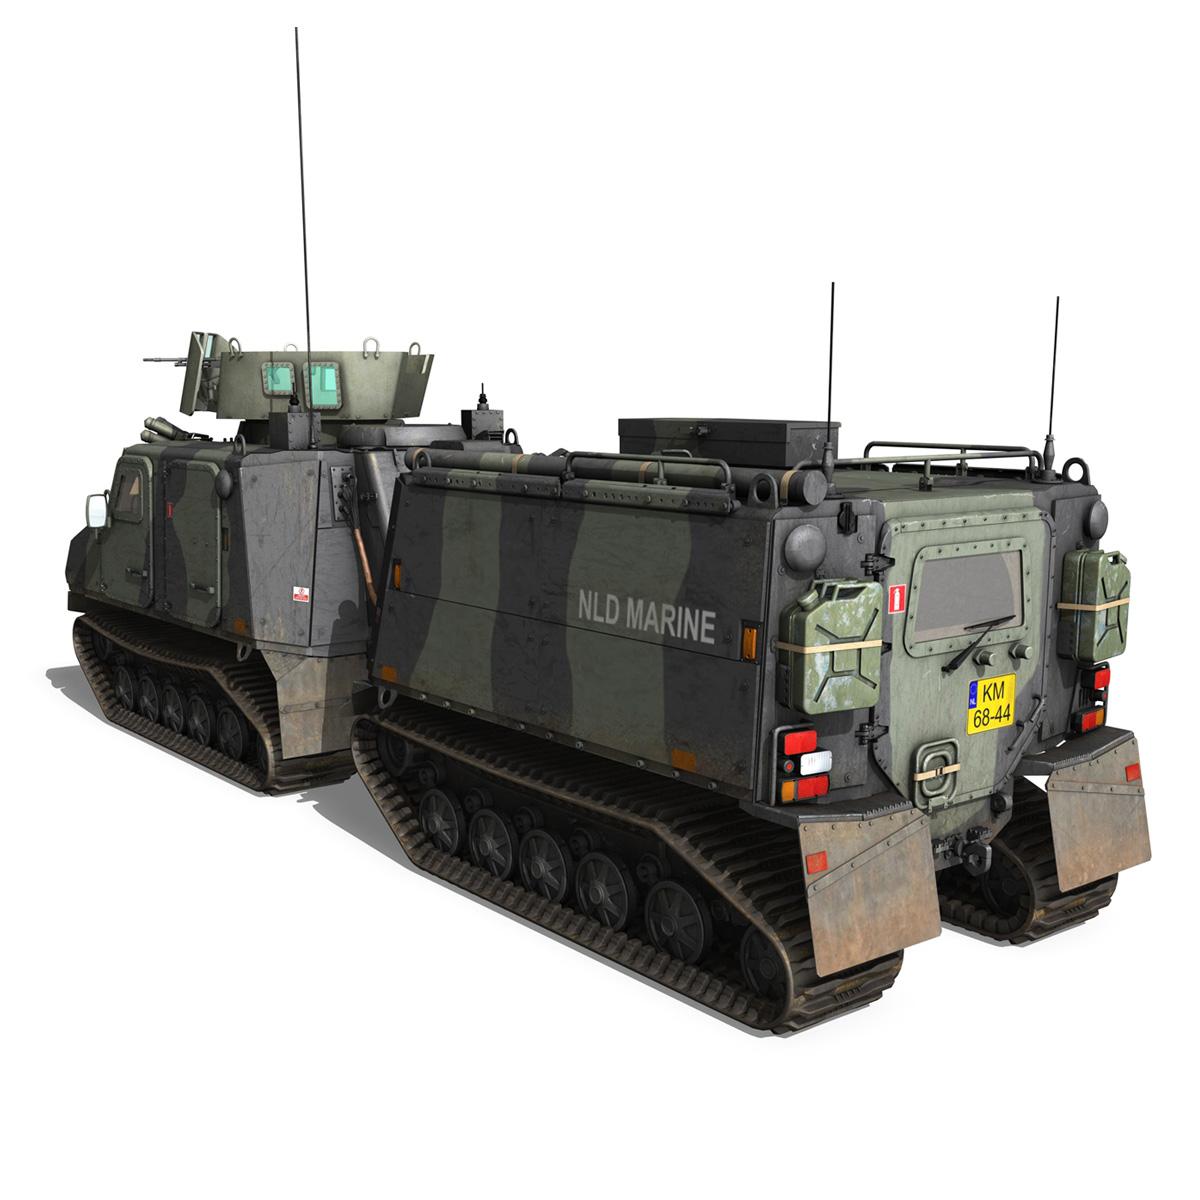 bvs10 viking – netherlands marine corps 3d model 3ds c4d lwo obj 293519